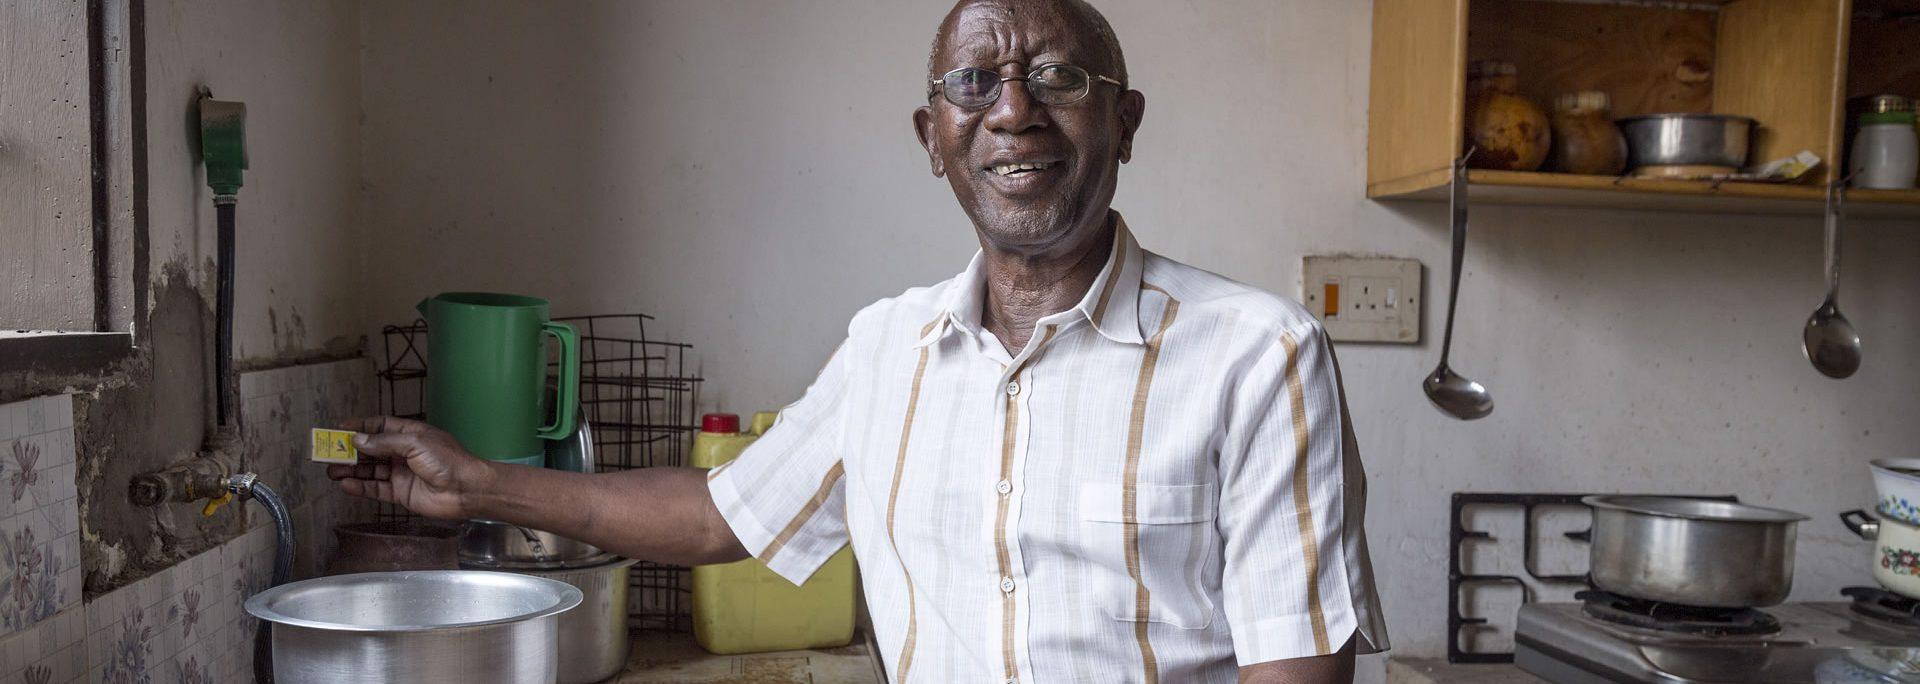 A man lighting a biogas stove in Uganda